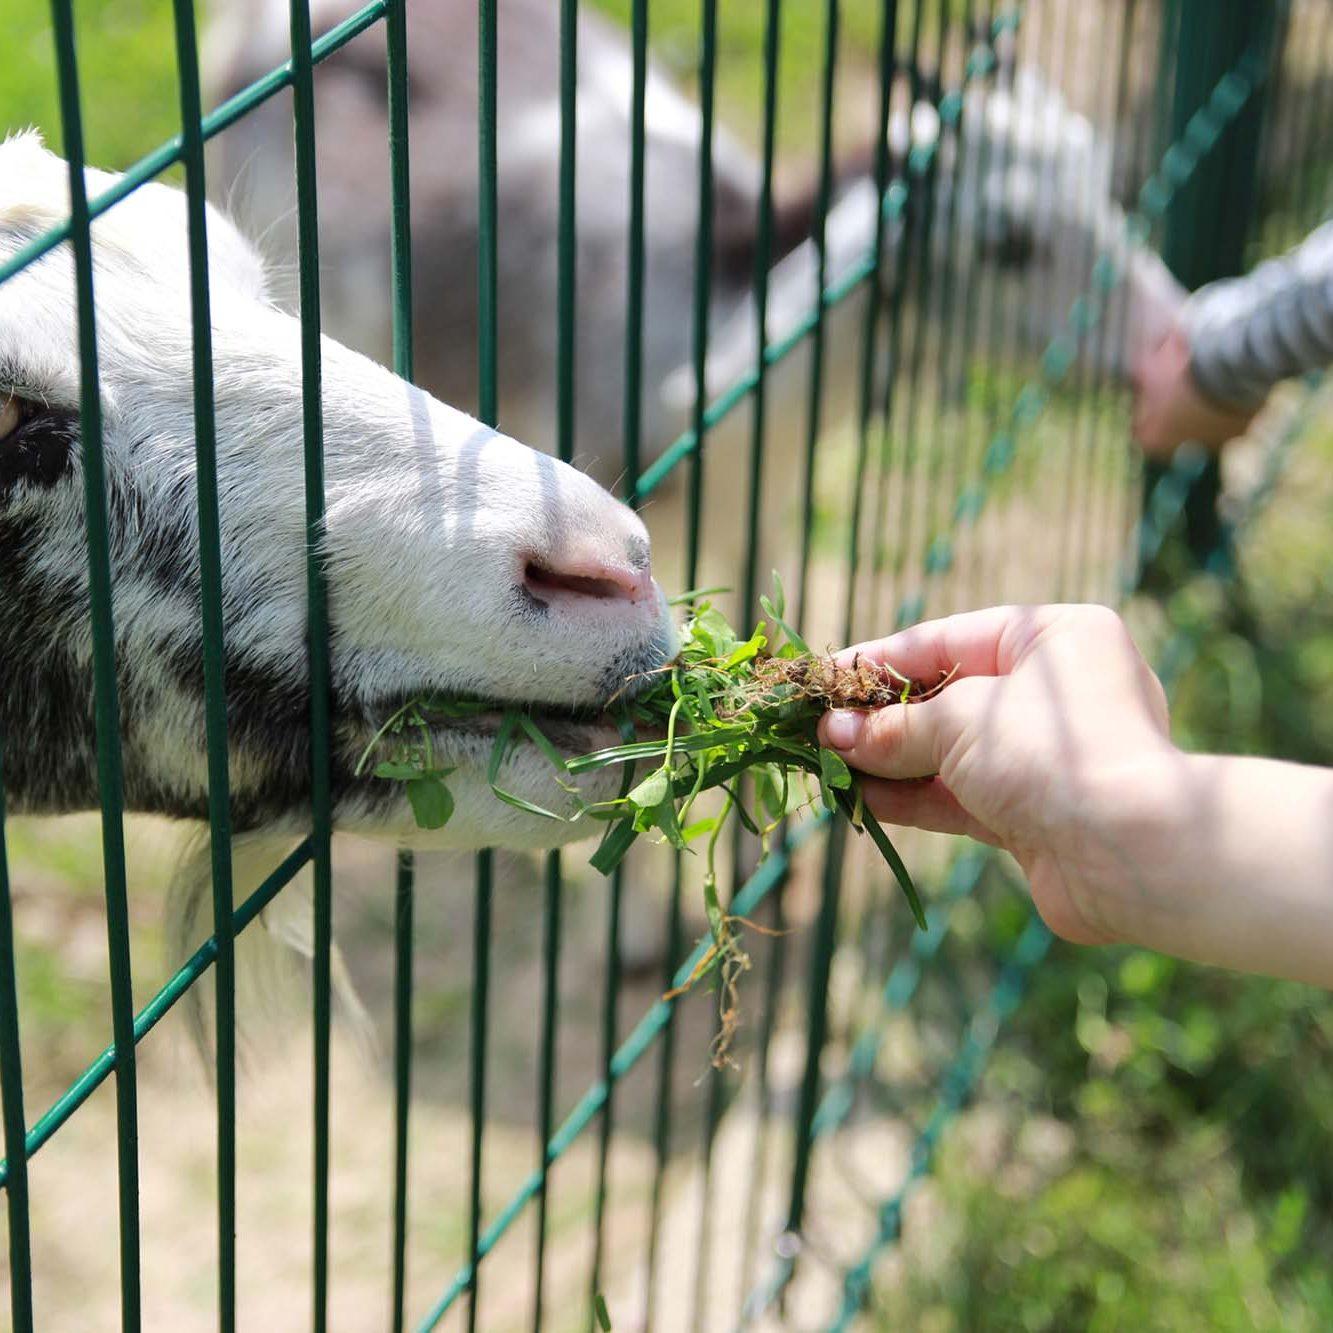 Children`s joy children feed goats in the zoo